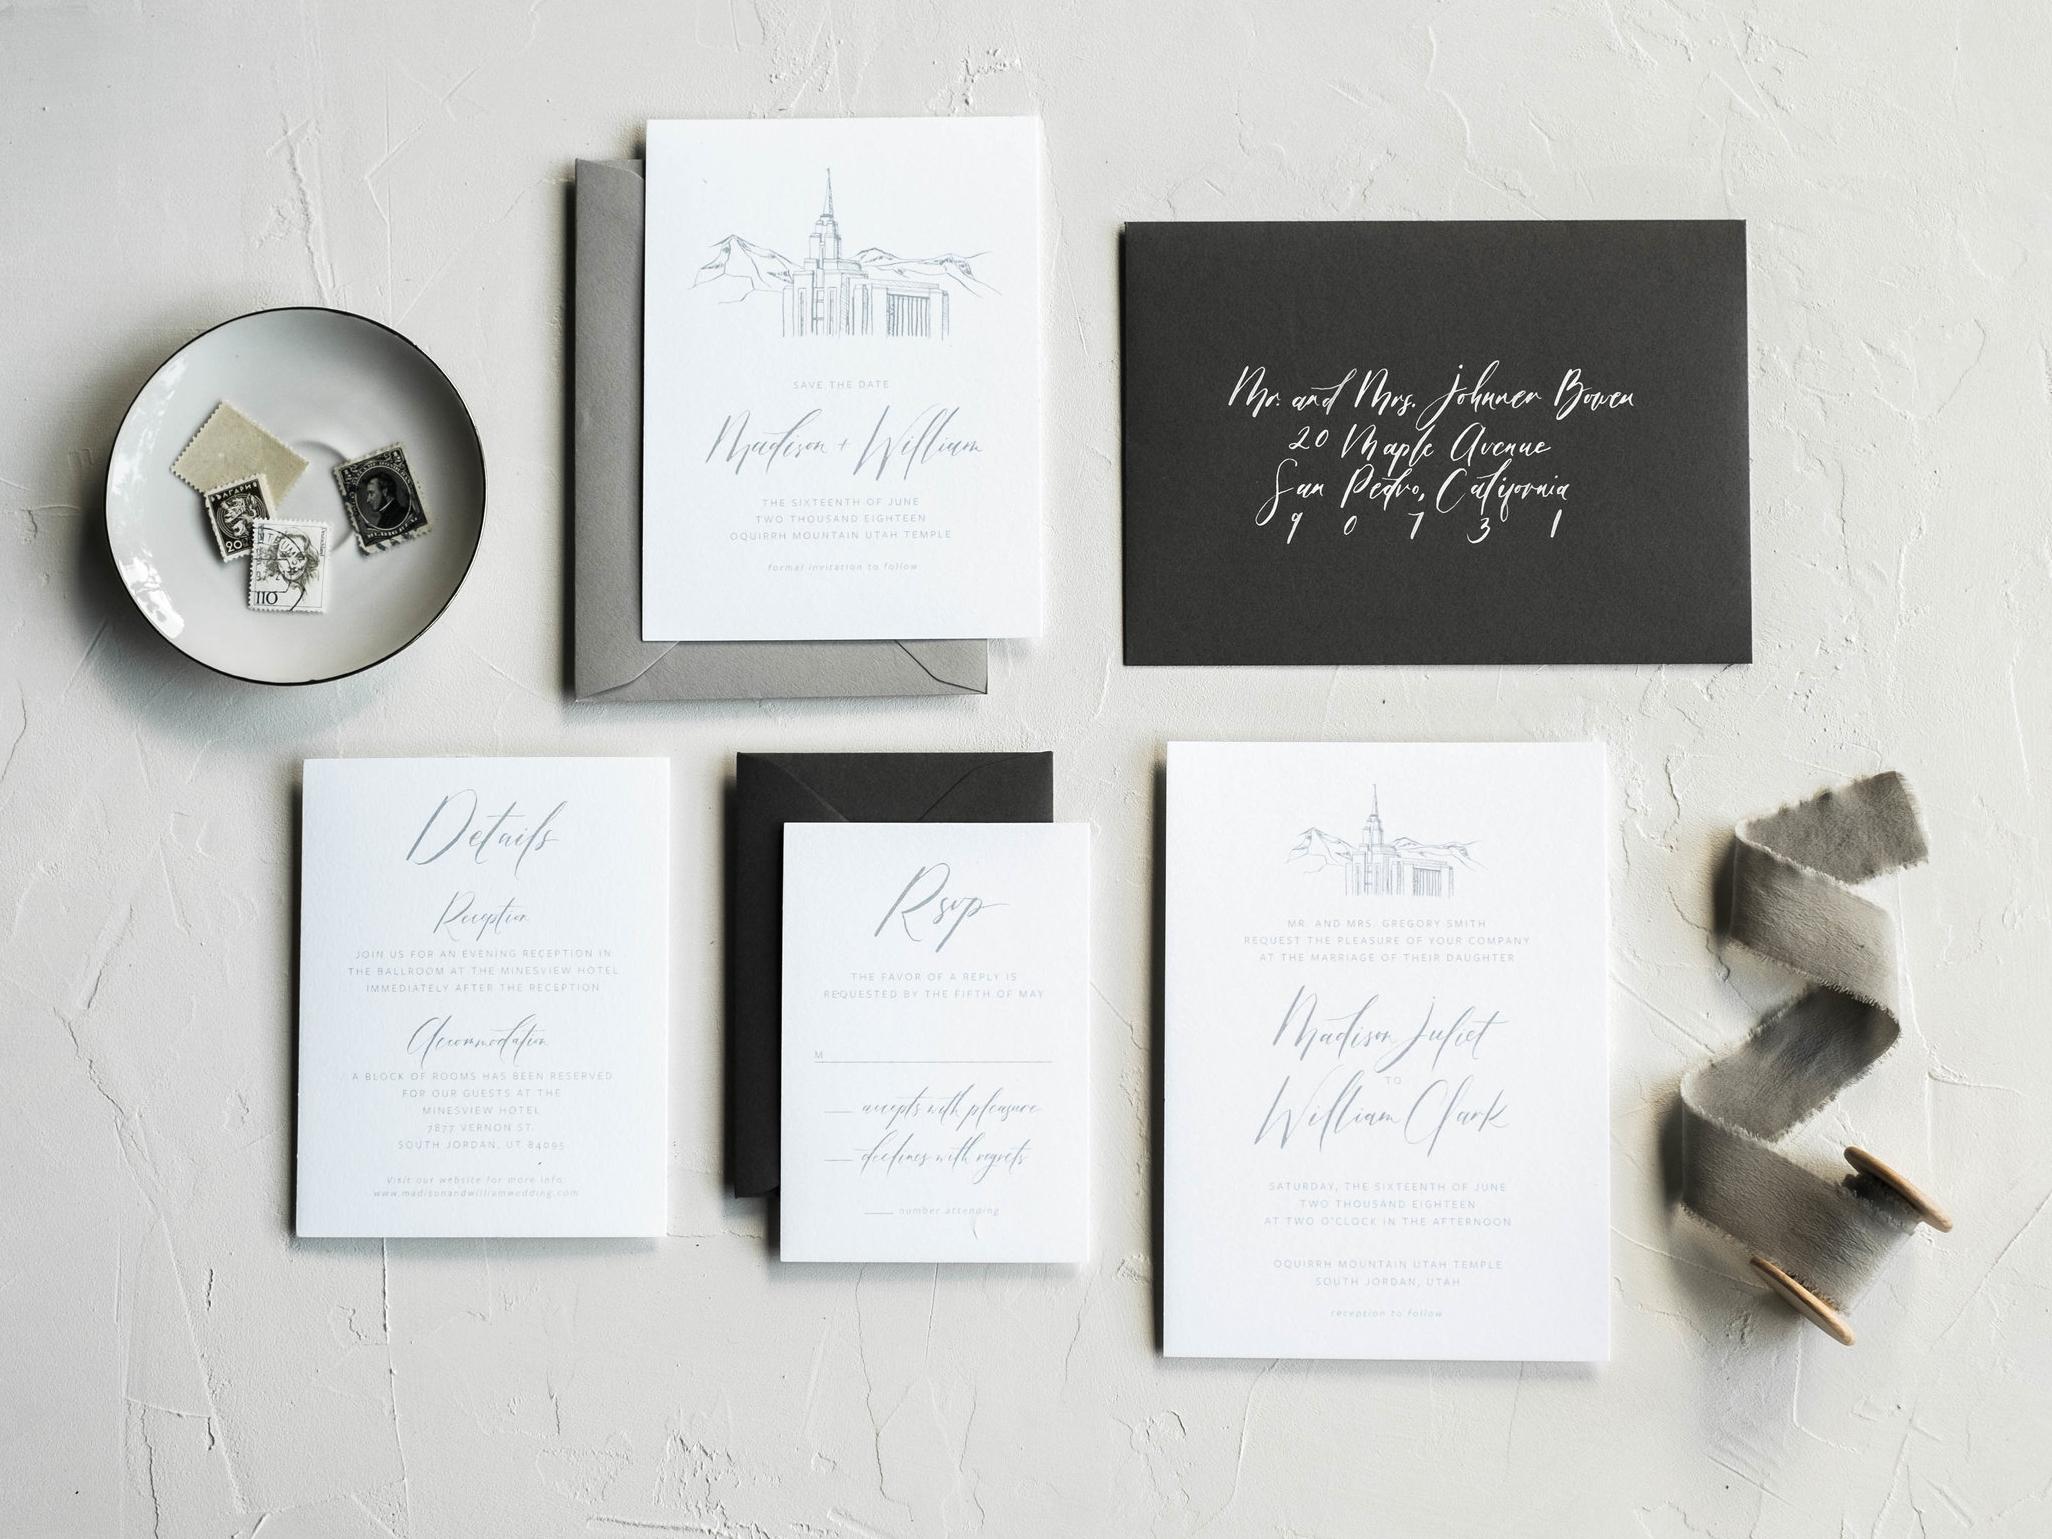 The Venue Wedding Inivitation Suite